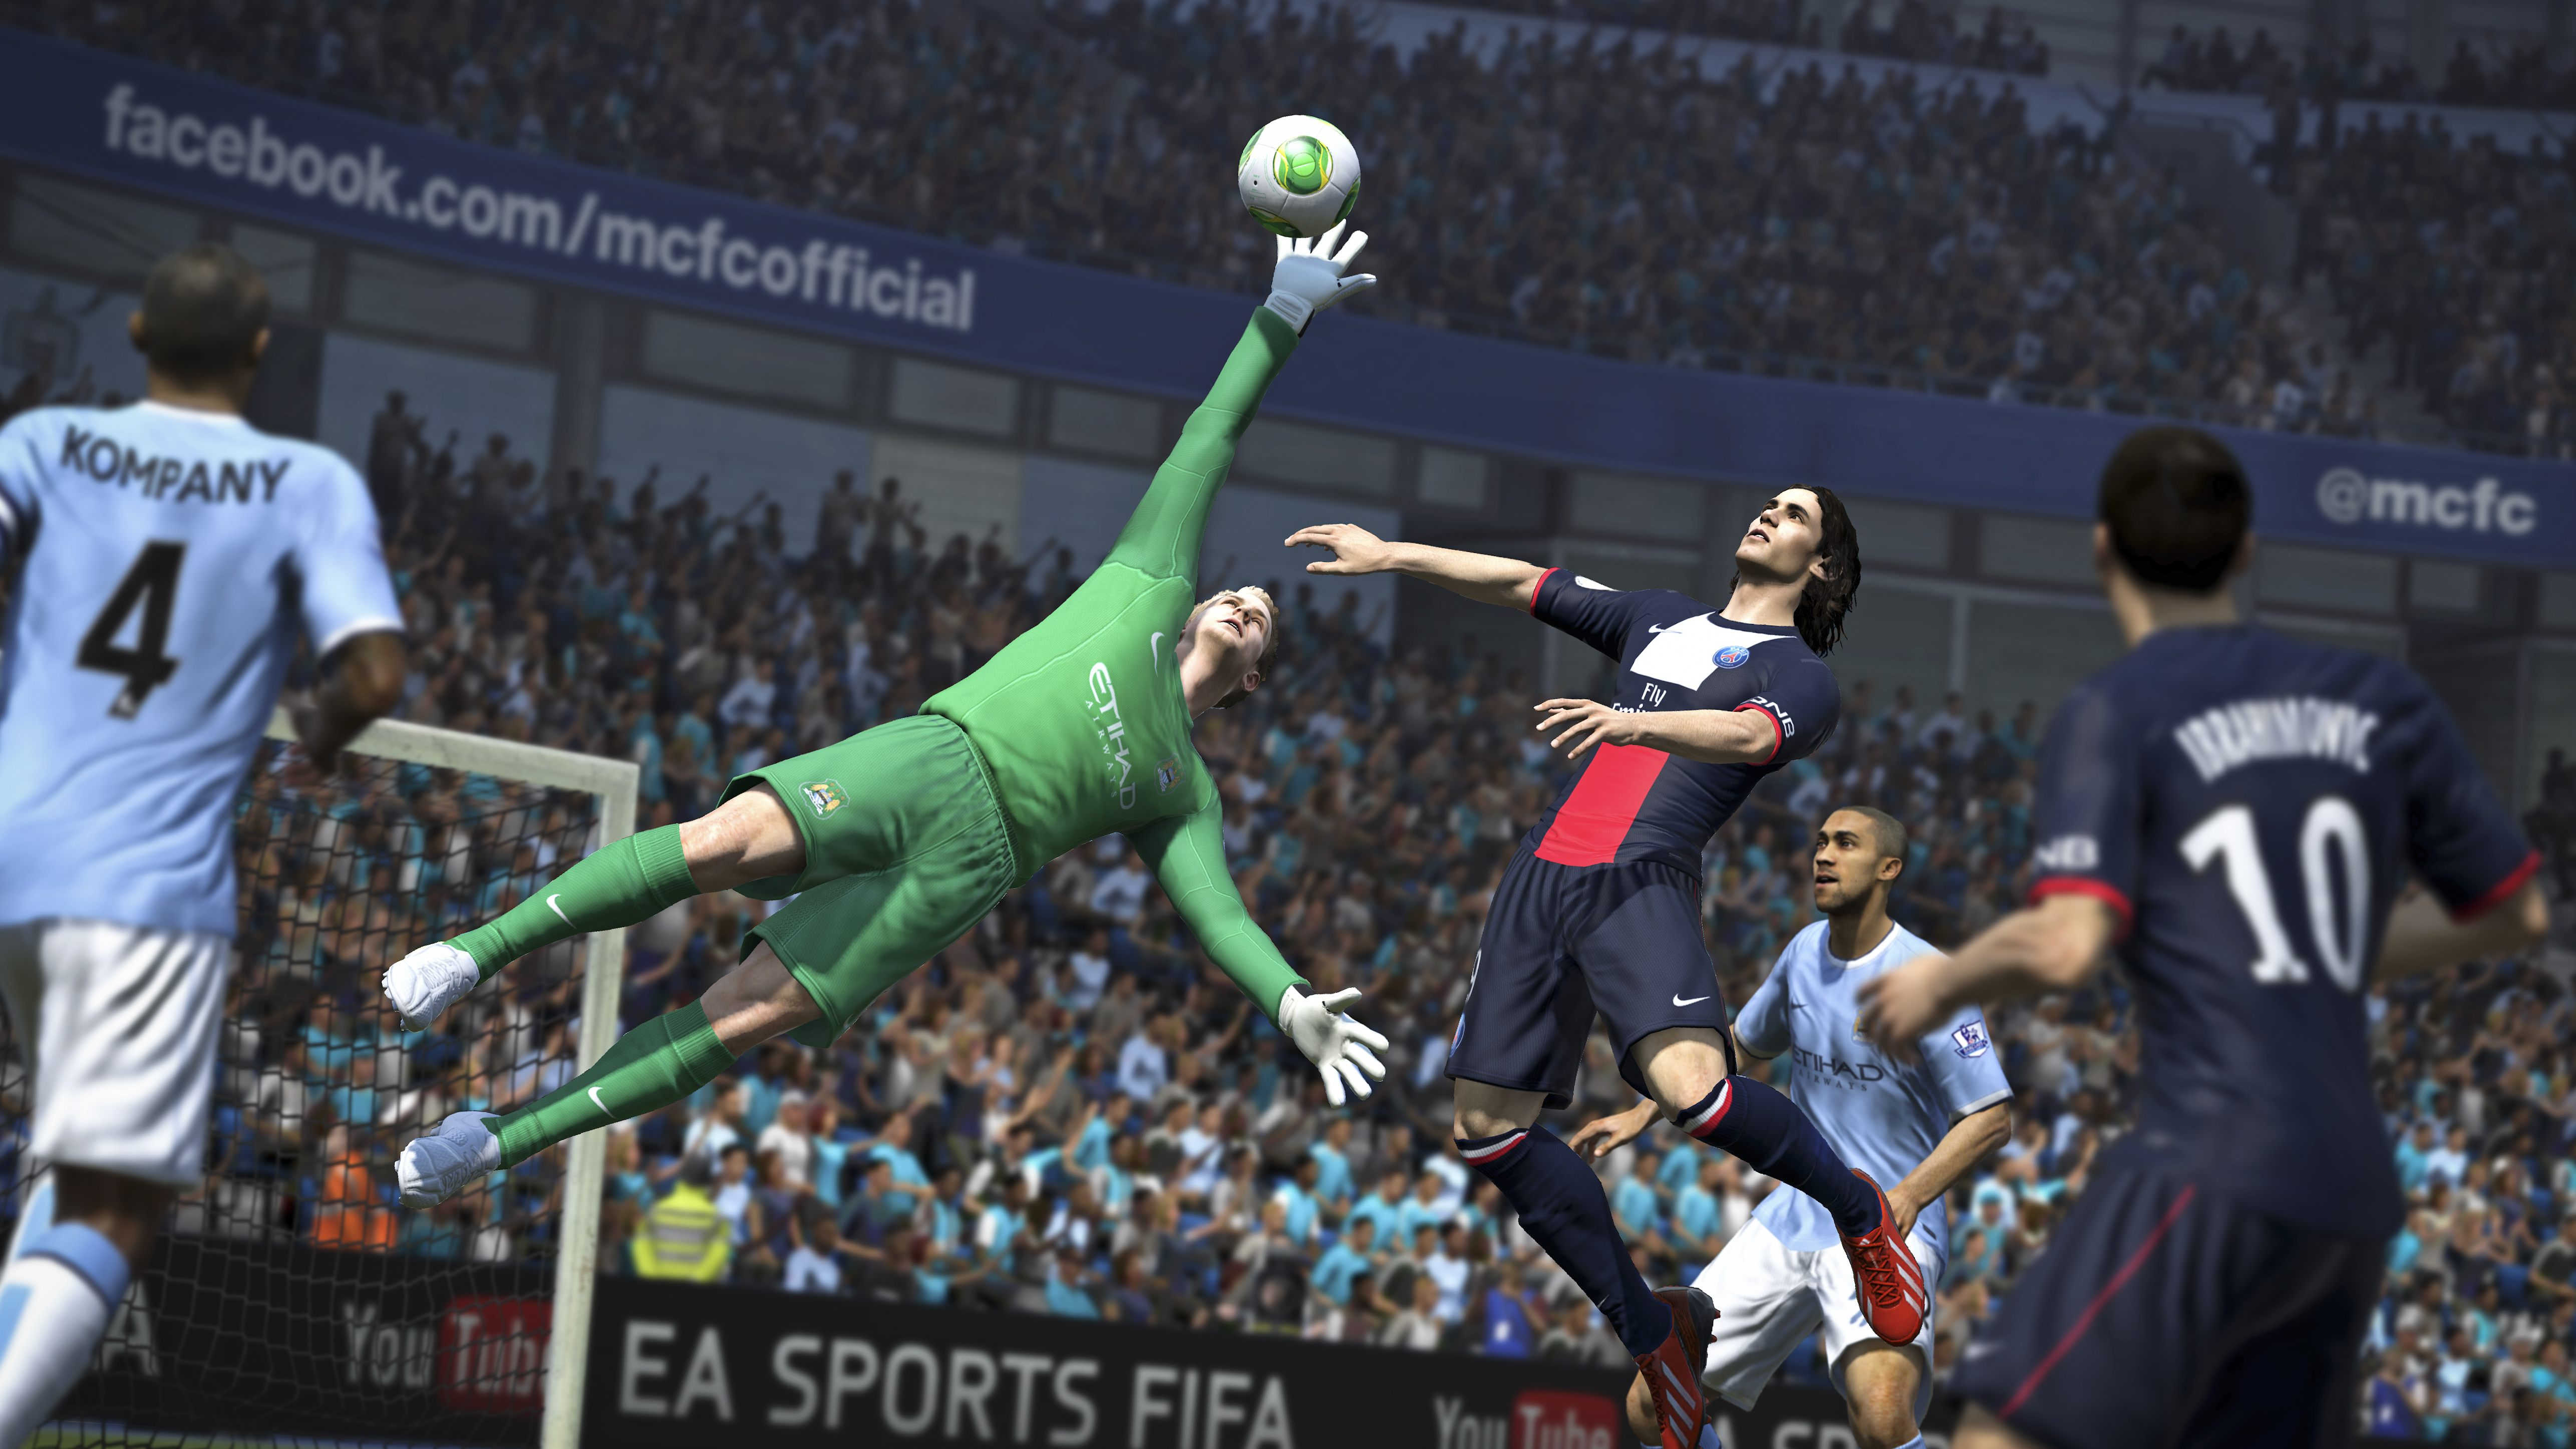 Obrázky z inFamous, NFS: Rivals, FIFA 14, Alien Rage 86404